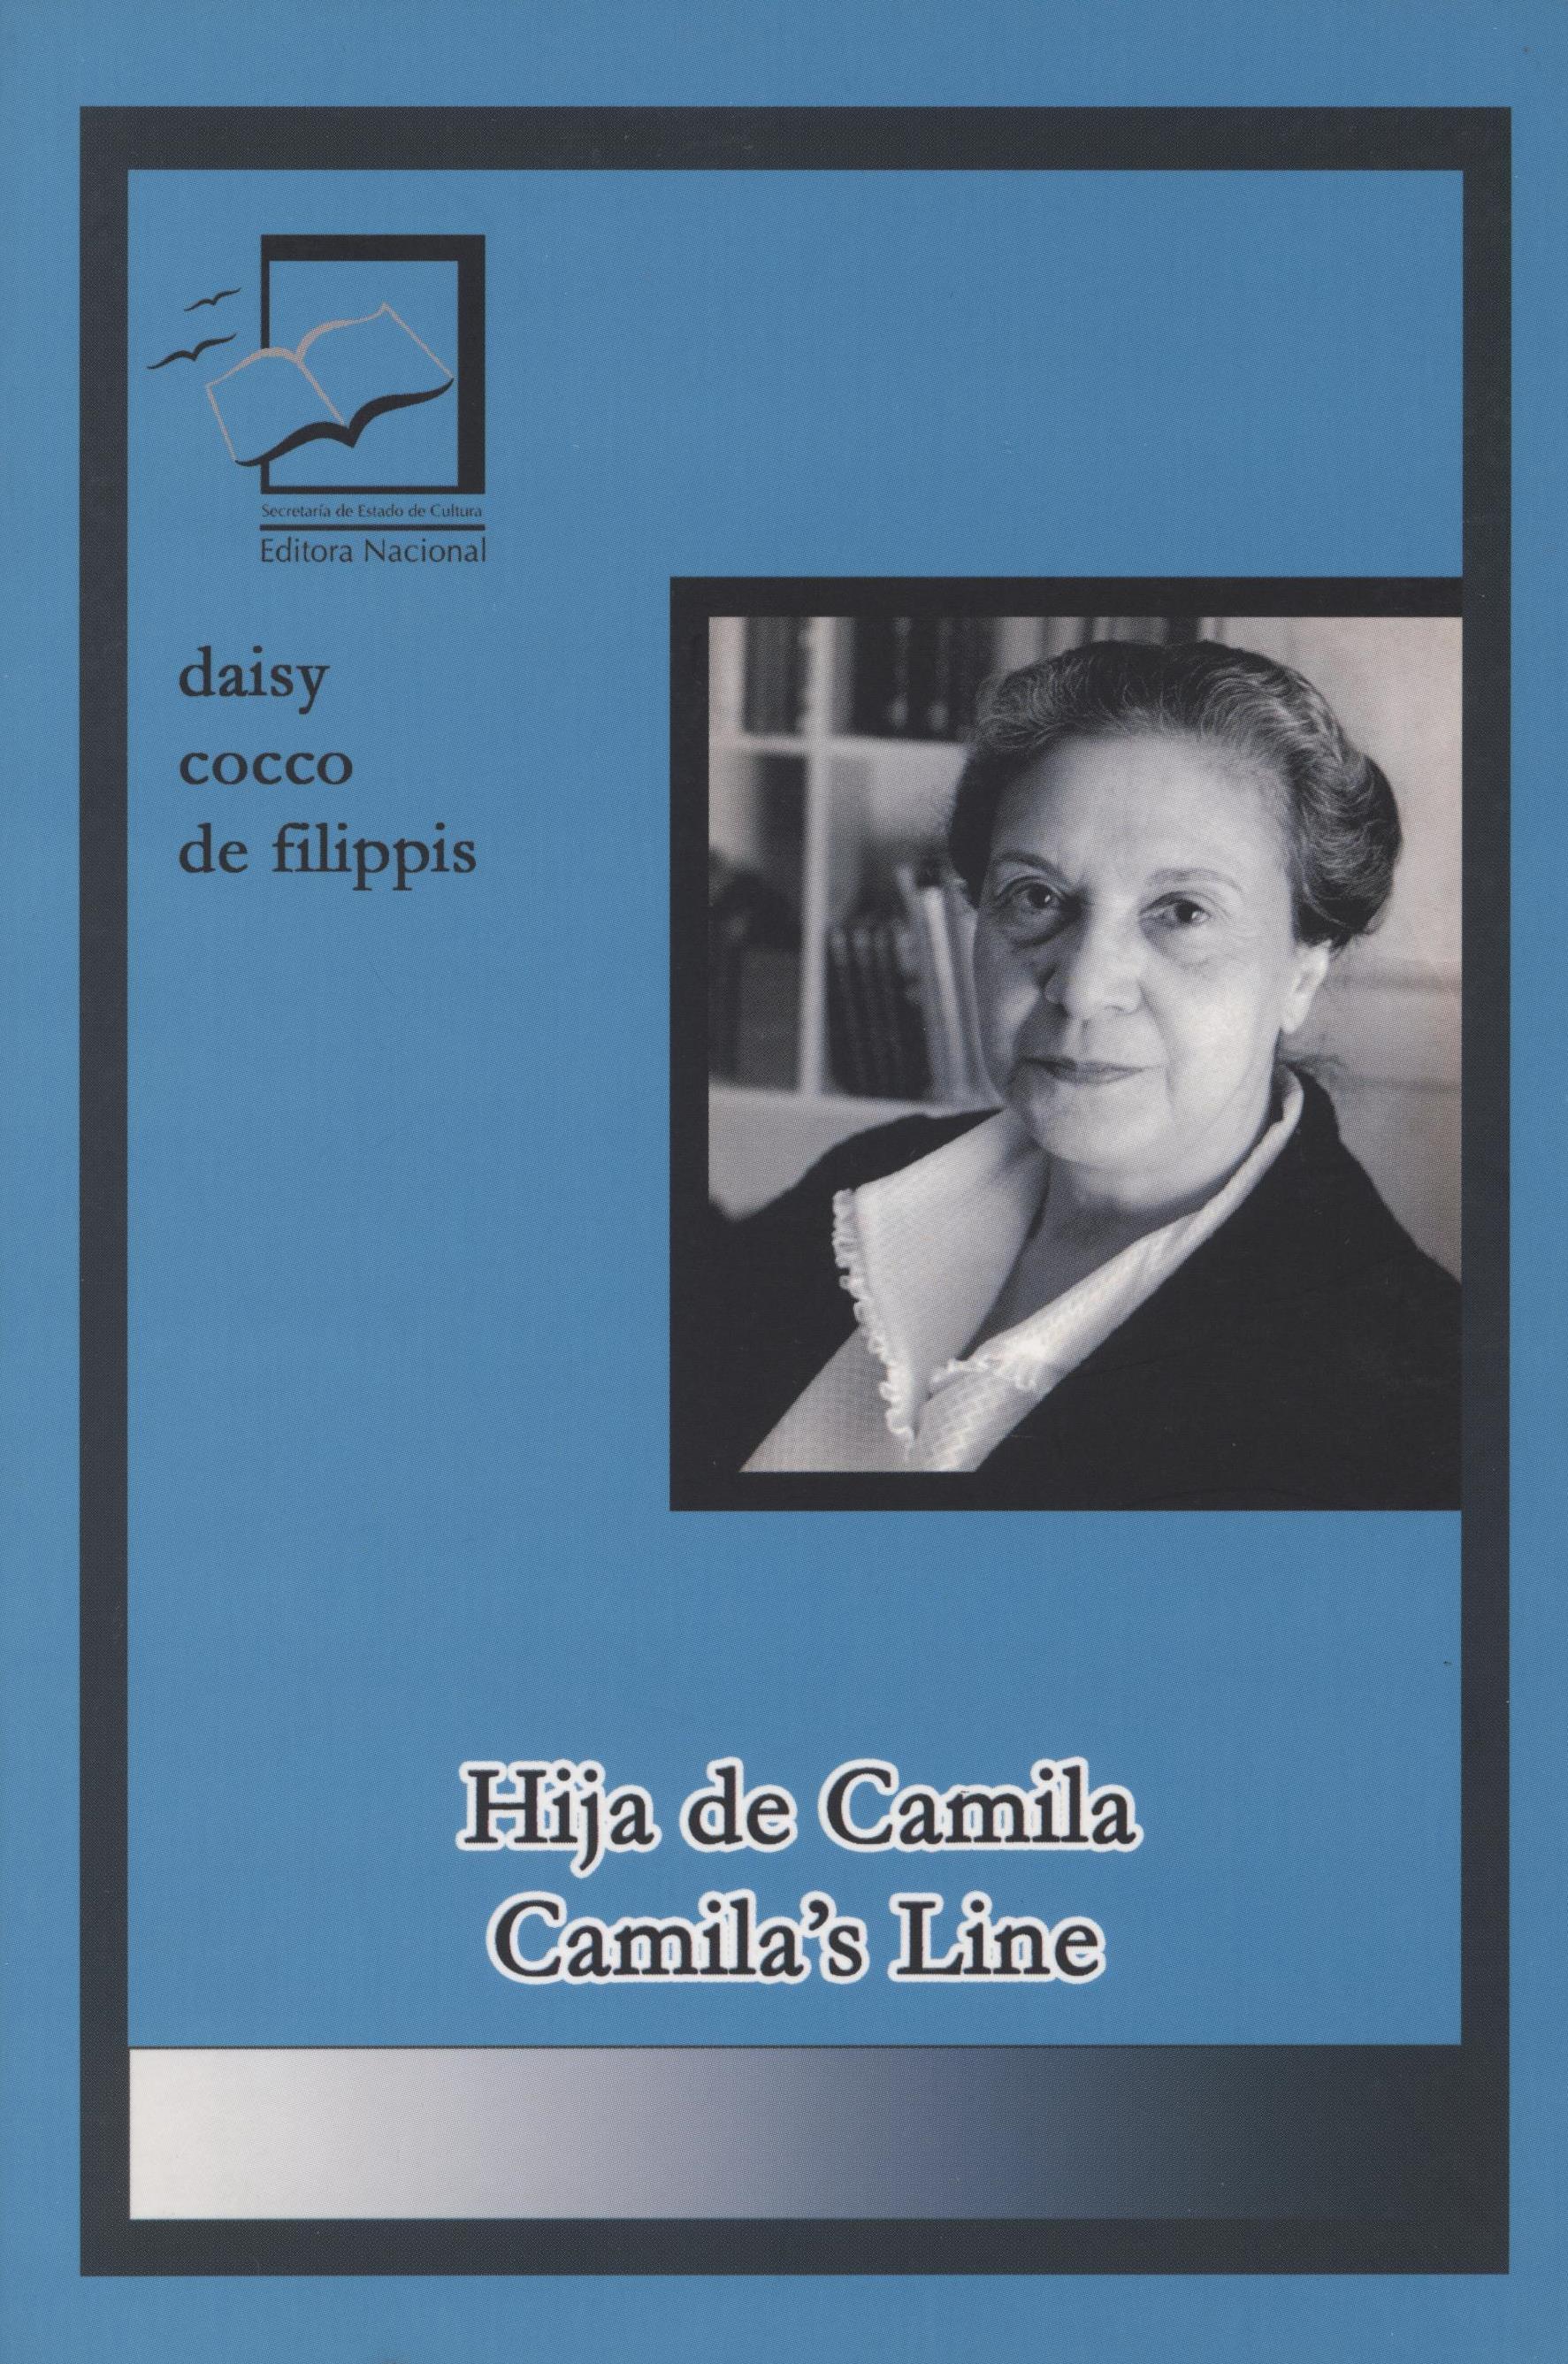 Hija de Camila. Daysi Cocco De Fillippis